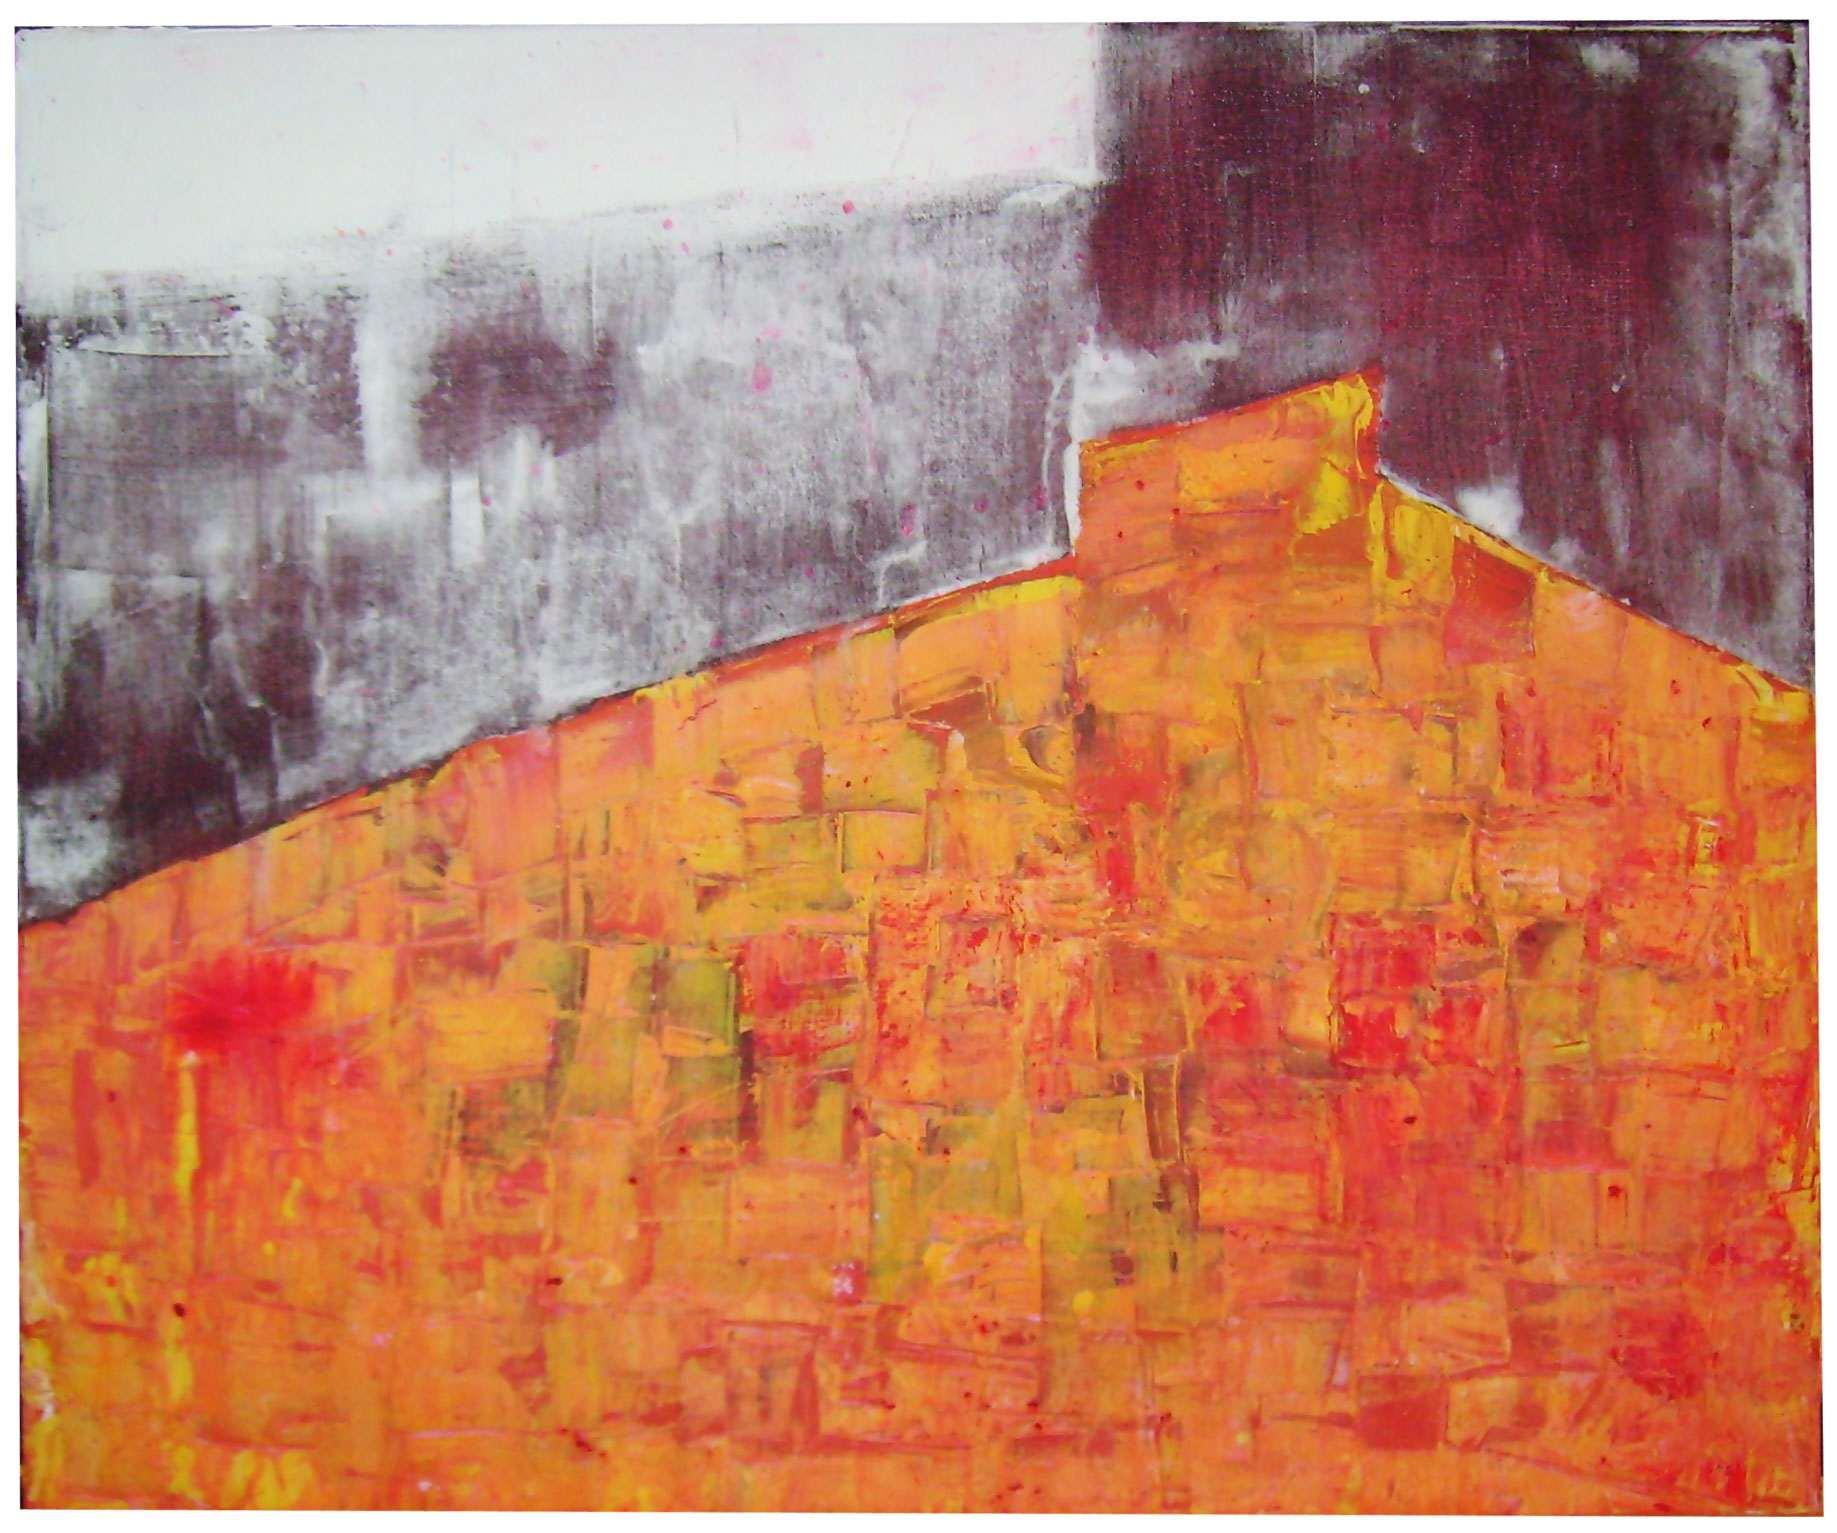 Untitled (Bldg), 2008